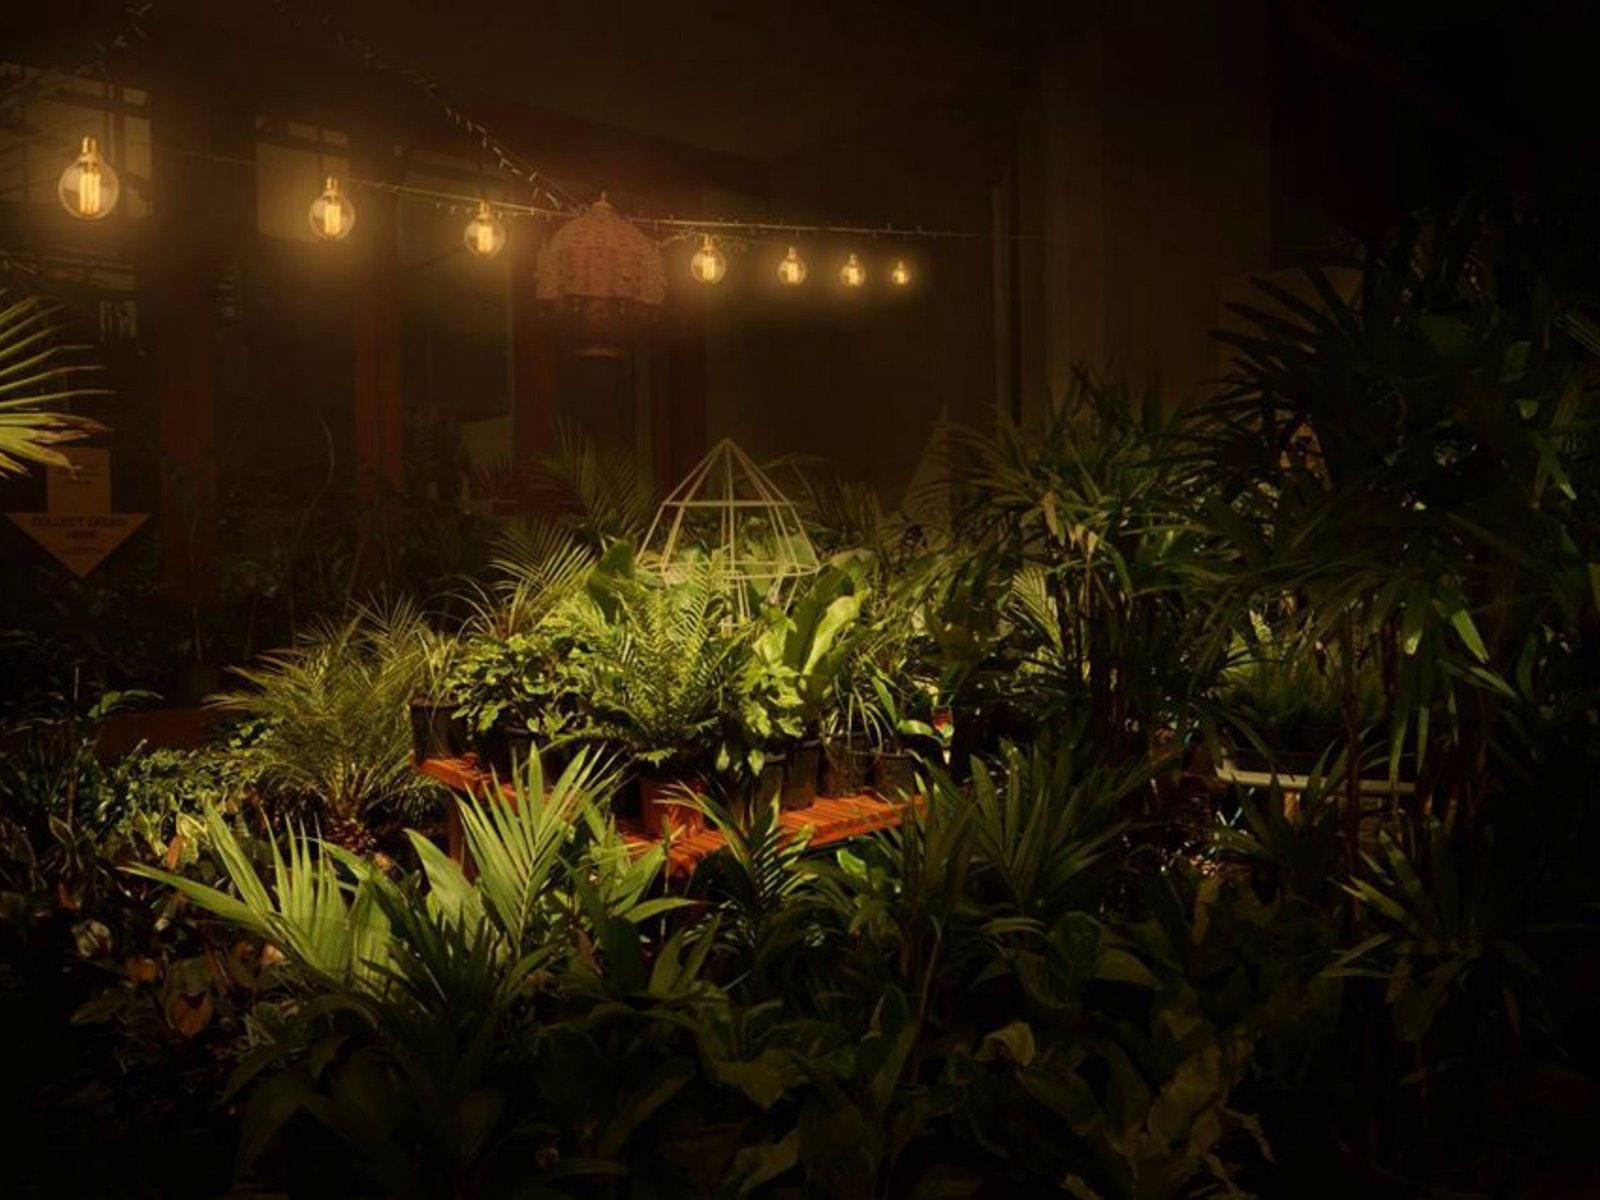 Twilight Indoor Plant Warehouse Sale